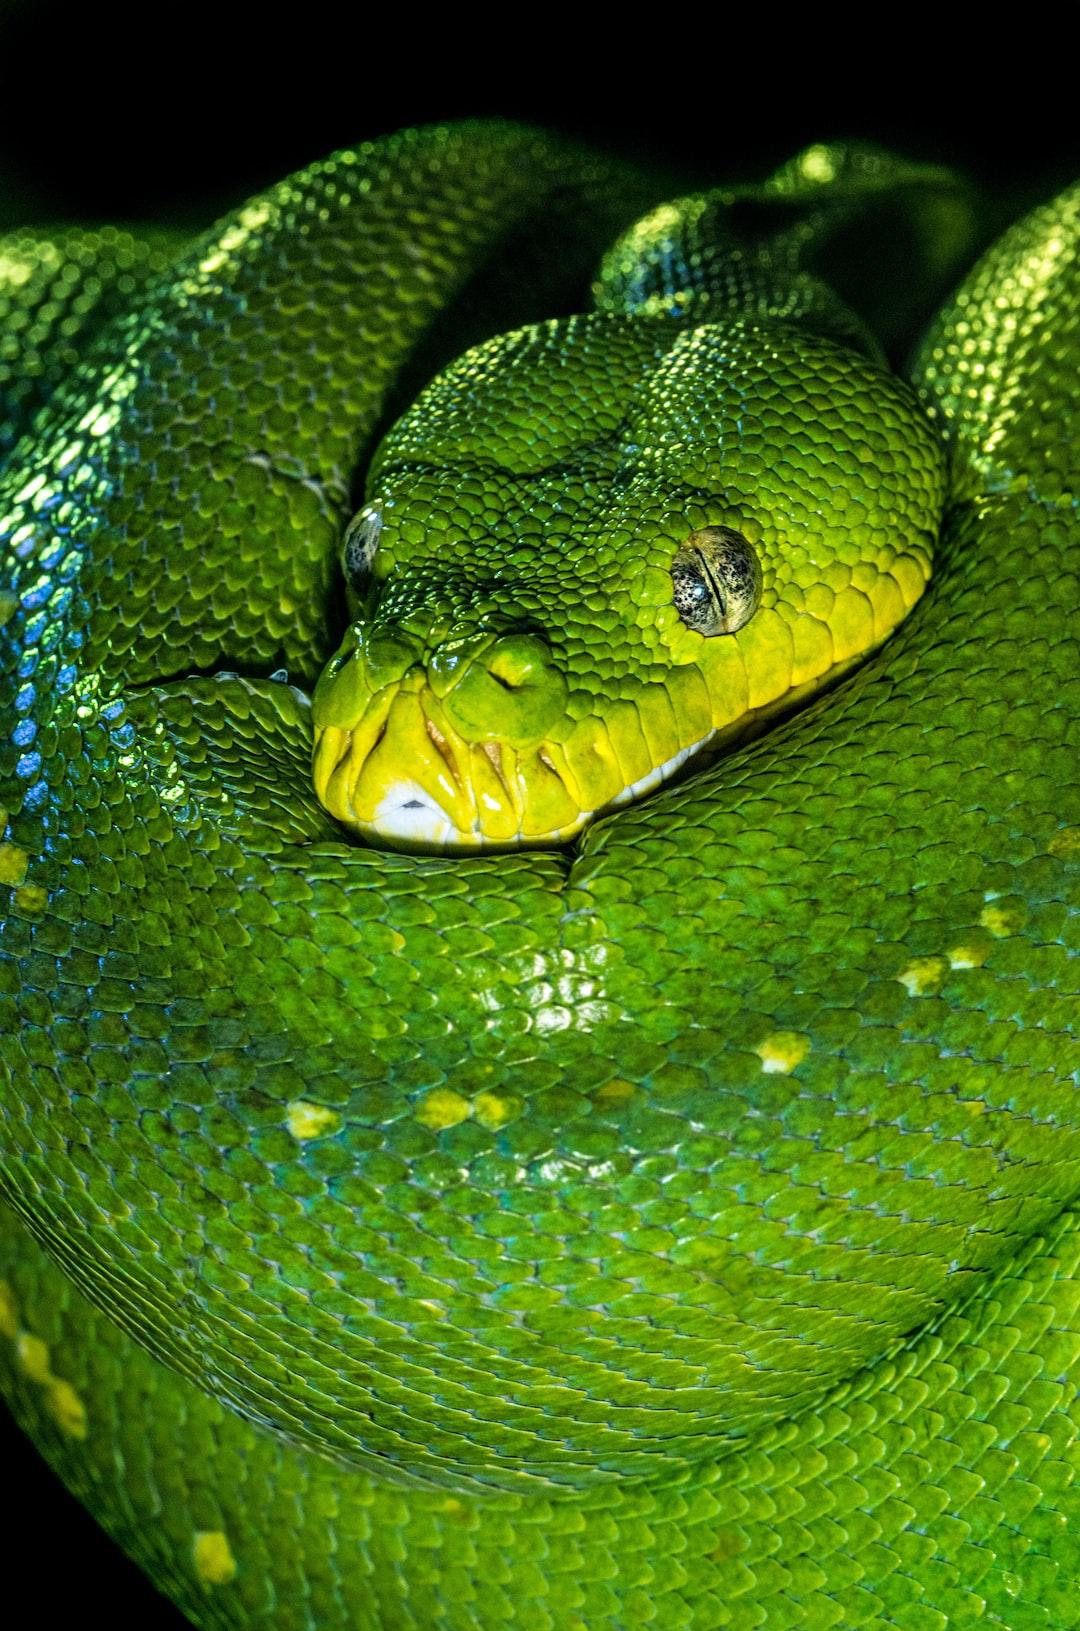 Python : compréhension des intensions en 1 minute